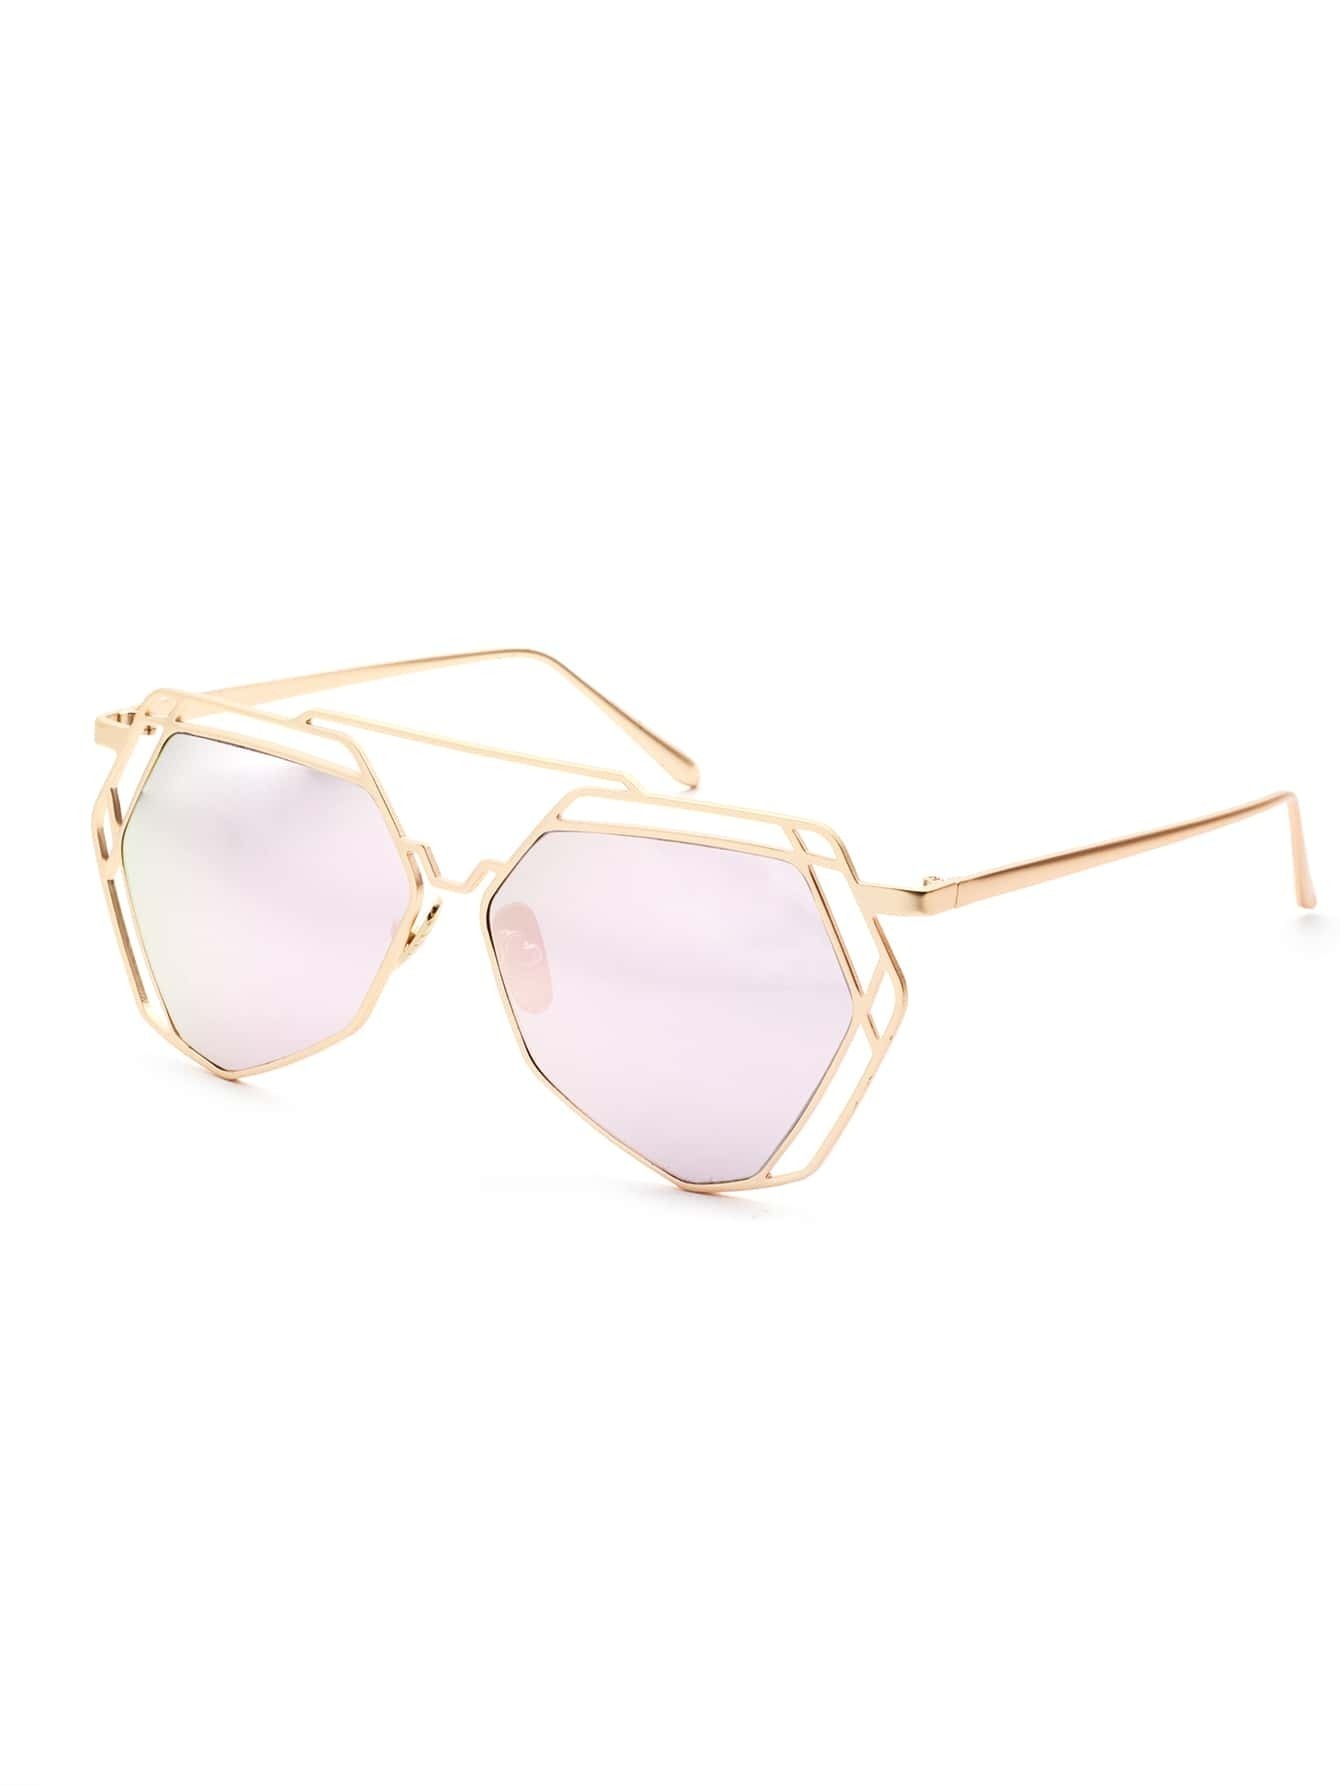 Gold Hollow Frame Double Bridge Pink Lens Sunglasses